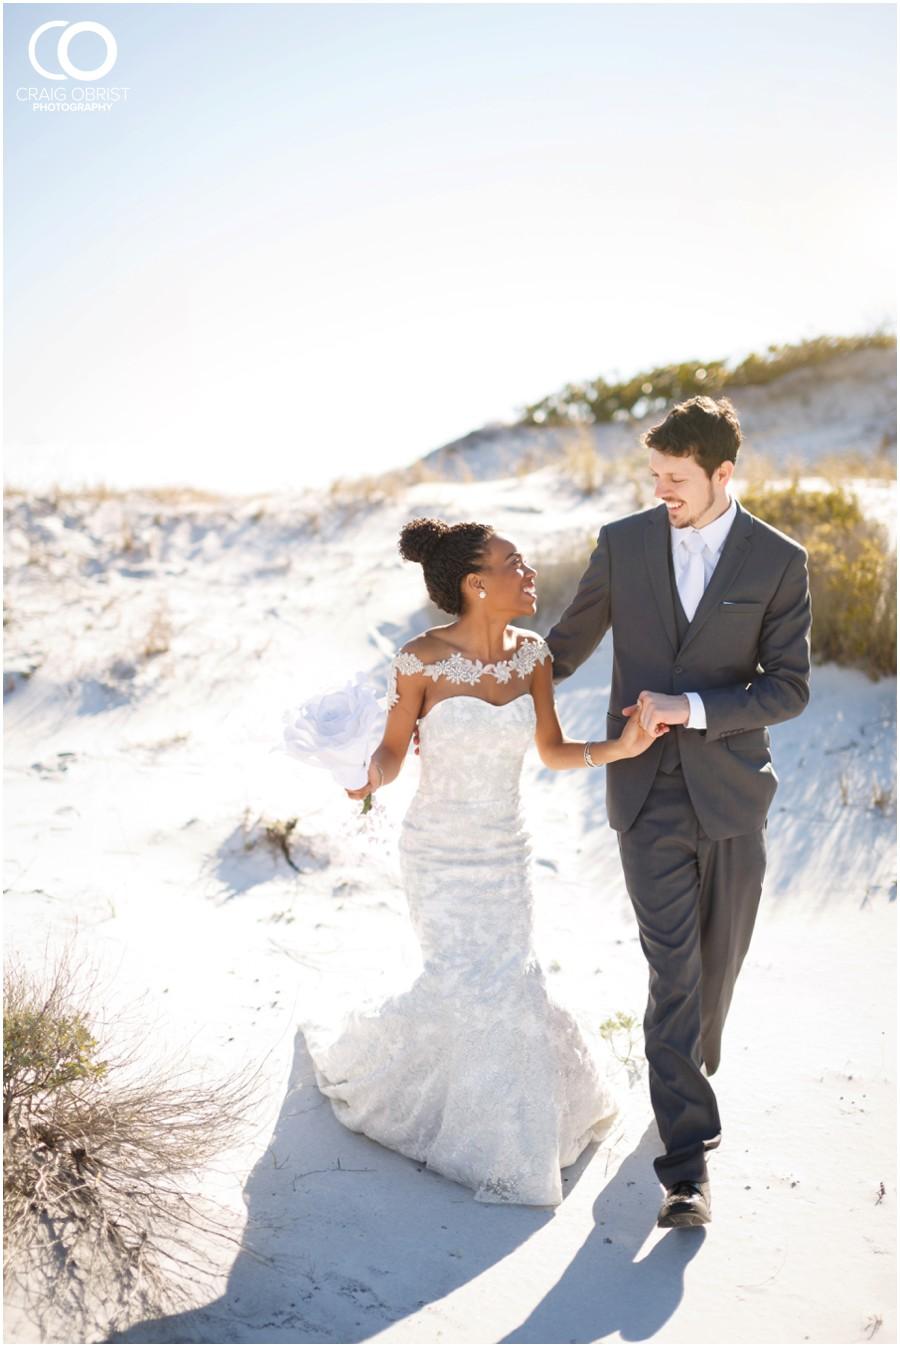 Seaside-30A-Beachside-Wedding-Sunset-Santa-Rosa-Photographer_0063.jpg